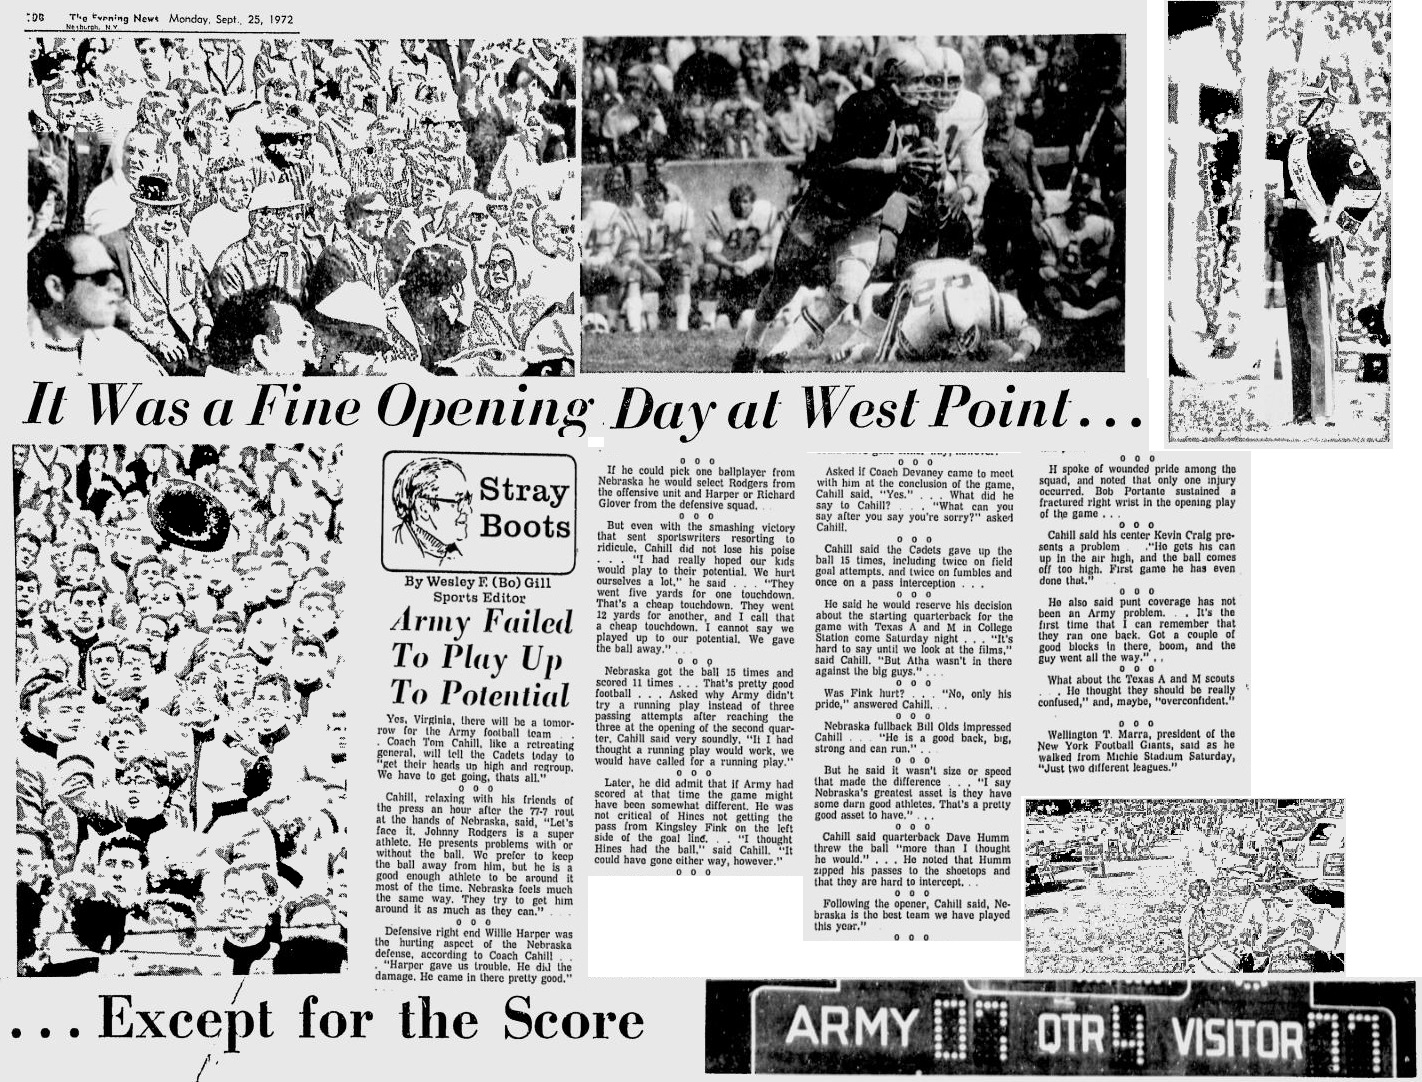 armyfb_1972_vsnebraska_eveningnews_sep251972